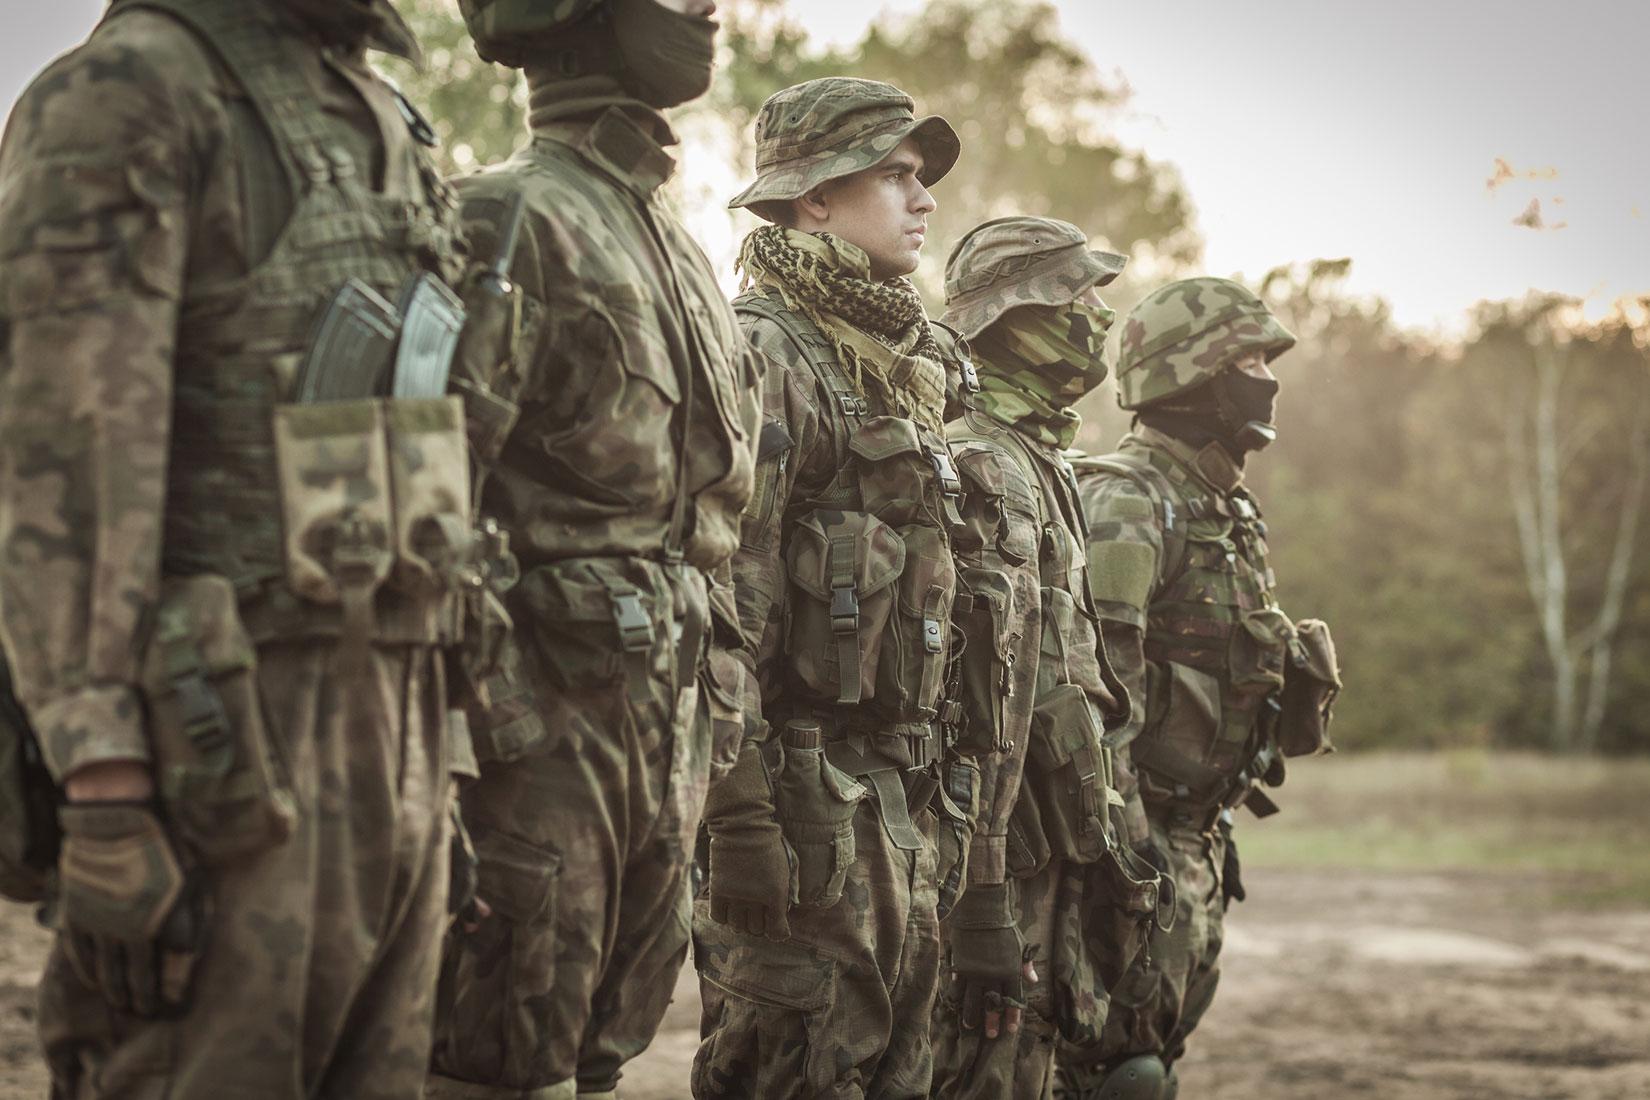 戦時作戦統制権返還を前に国連軍司令部機能強化の動き